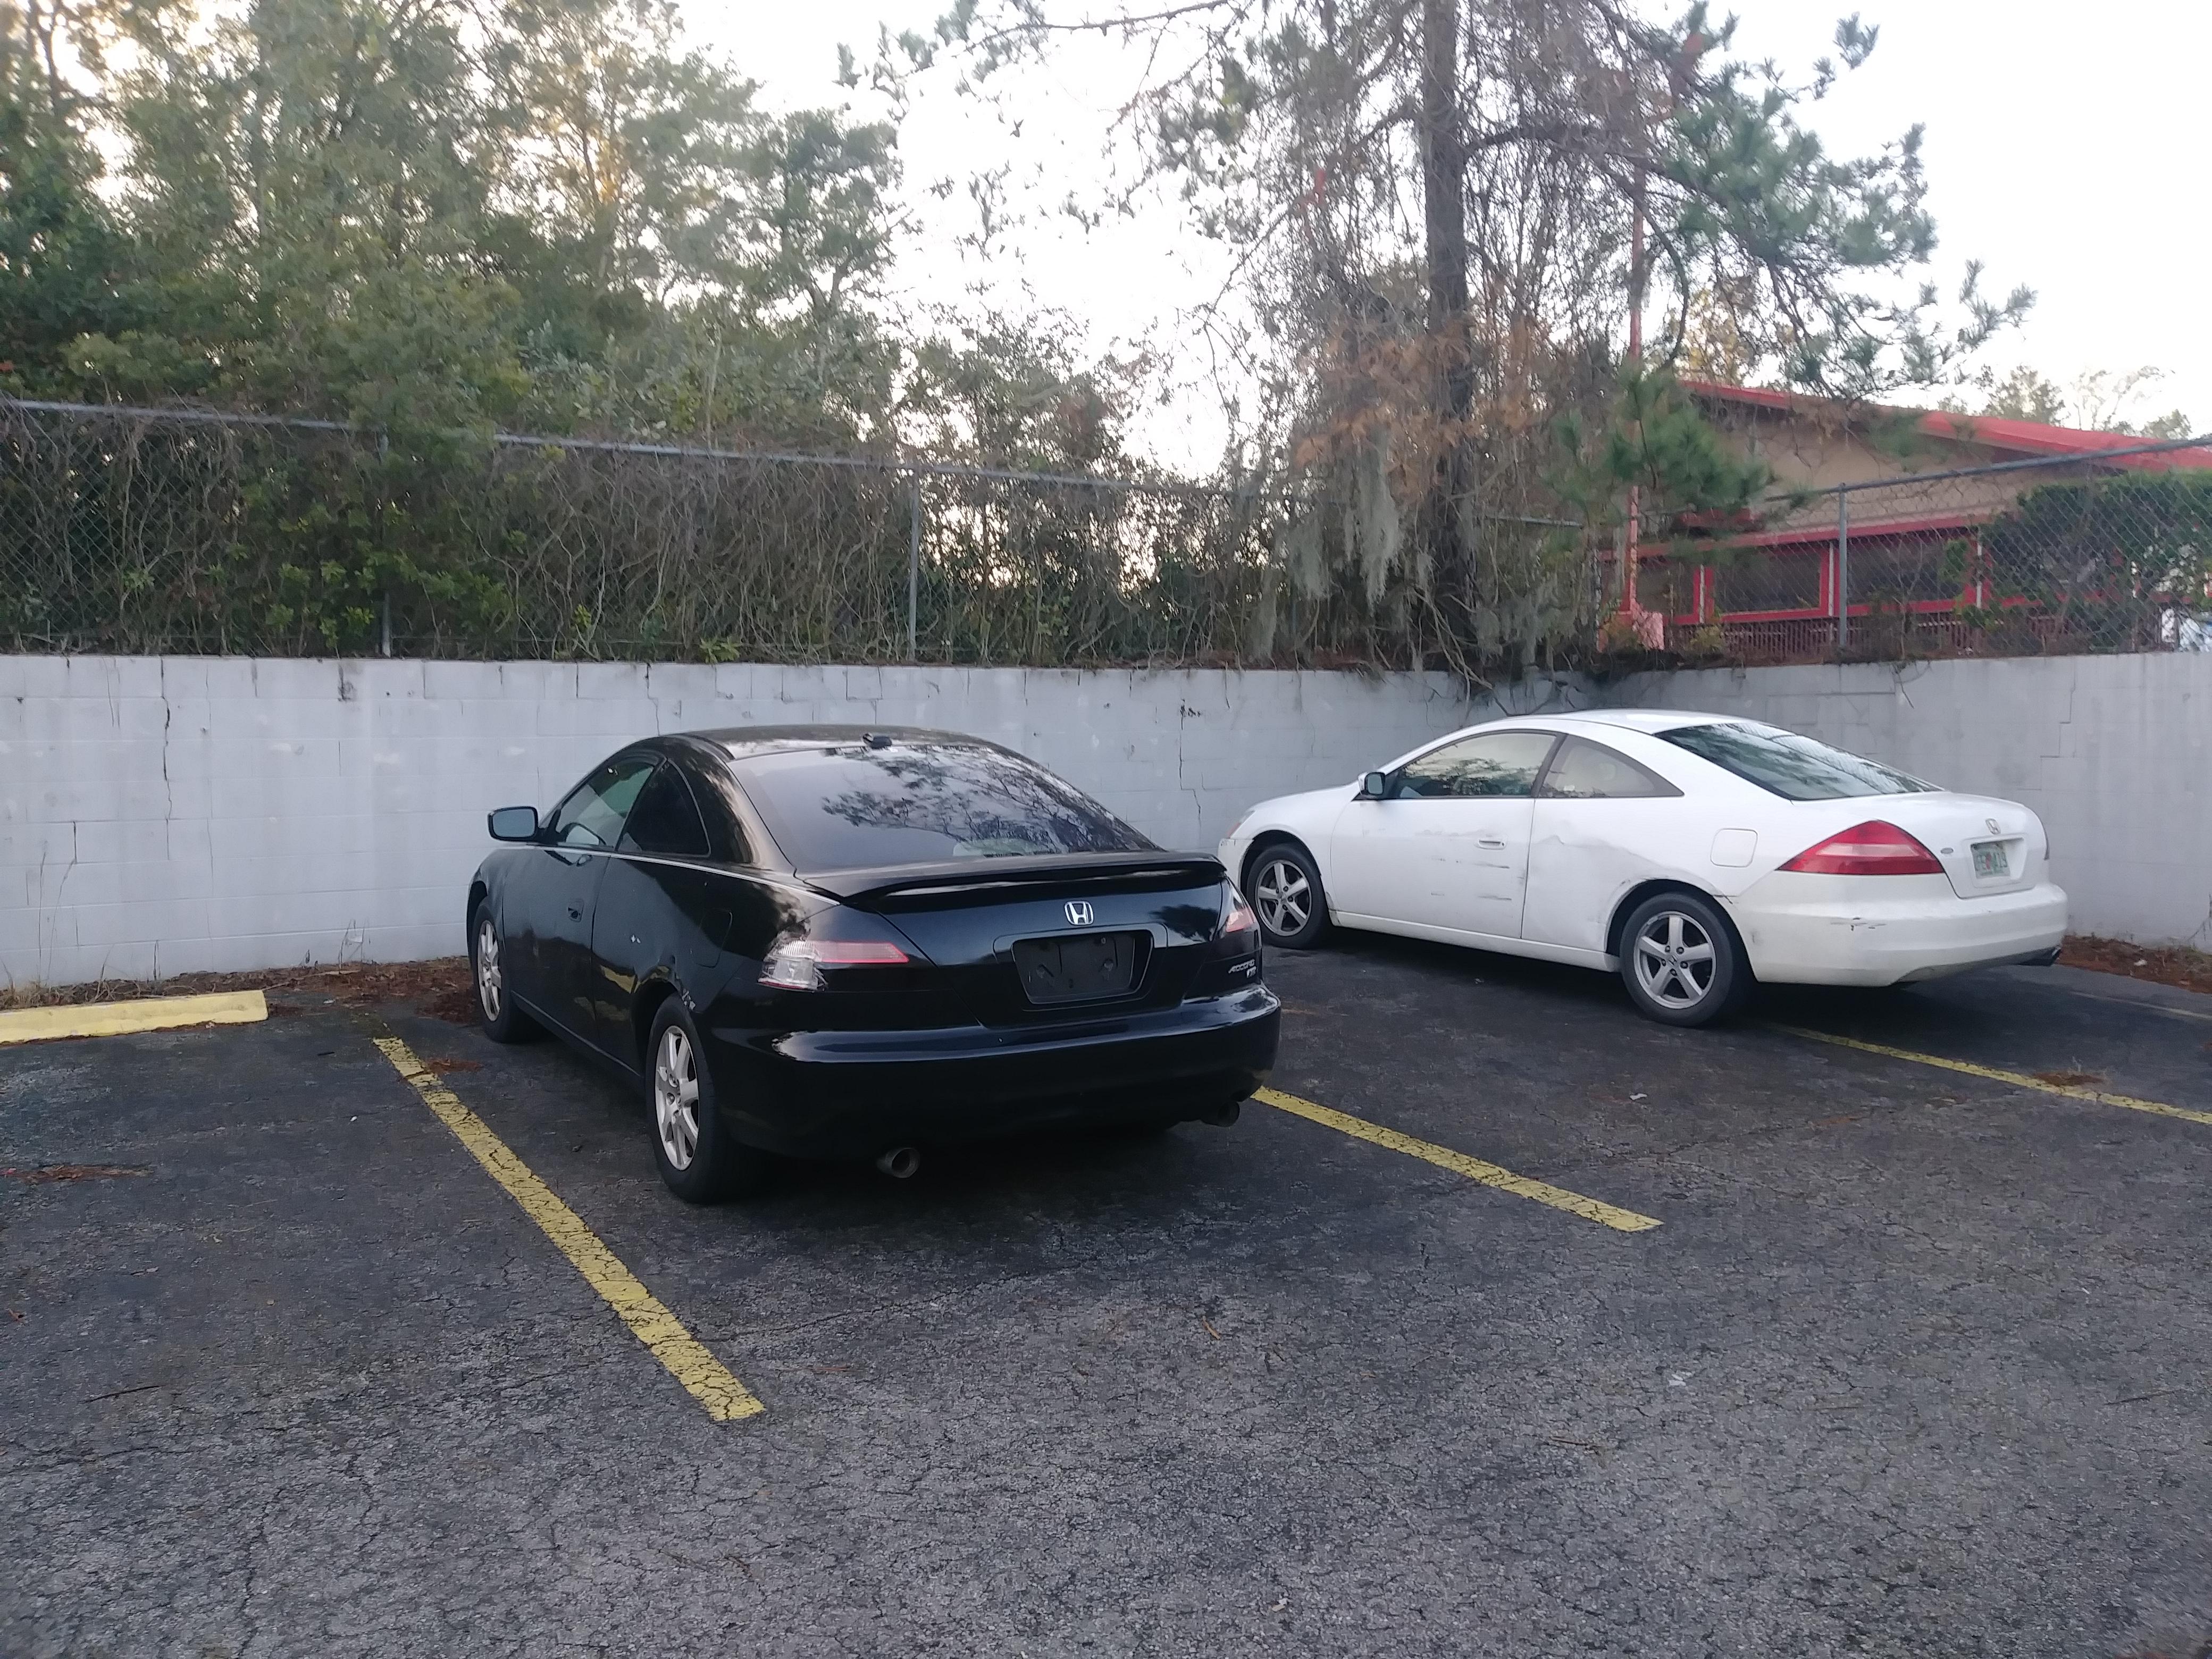 How i swapped a 6mt into an Auto - Honda Accord Forum : V6